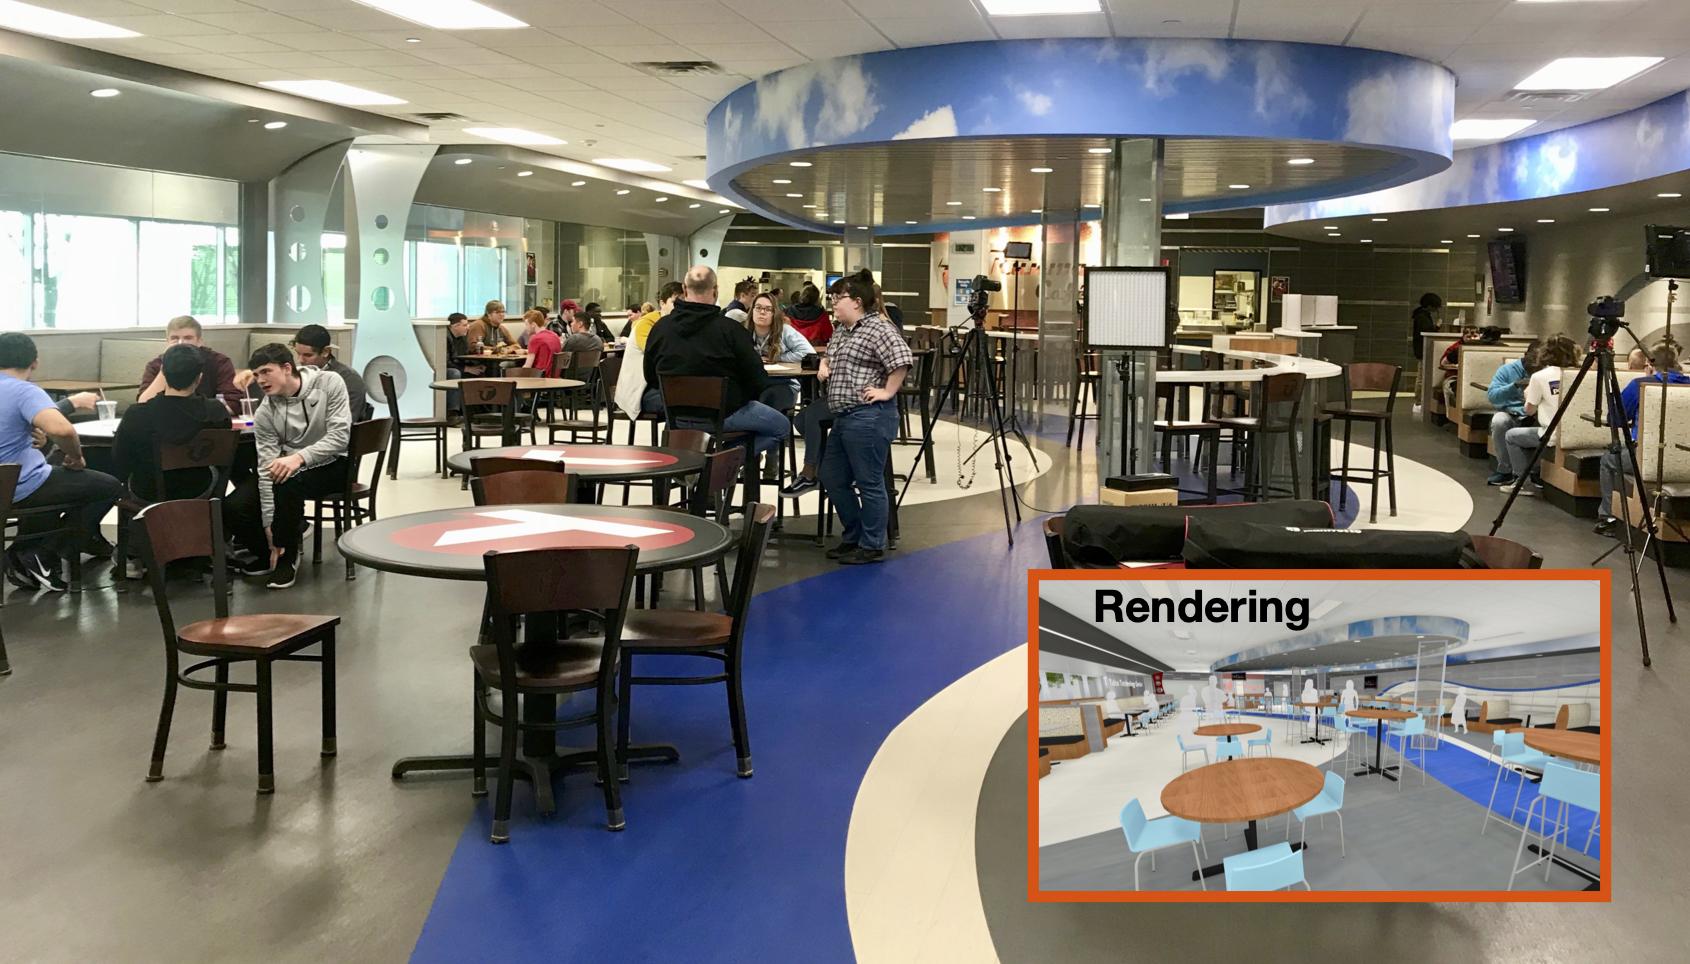 TTC cafe rendering comparison